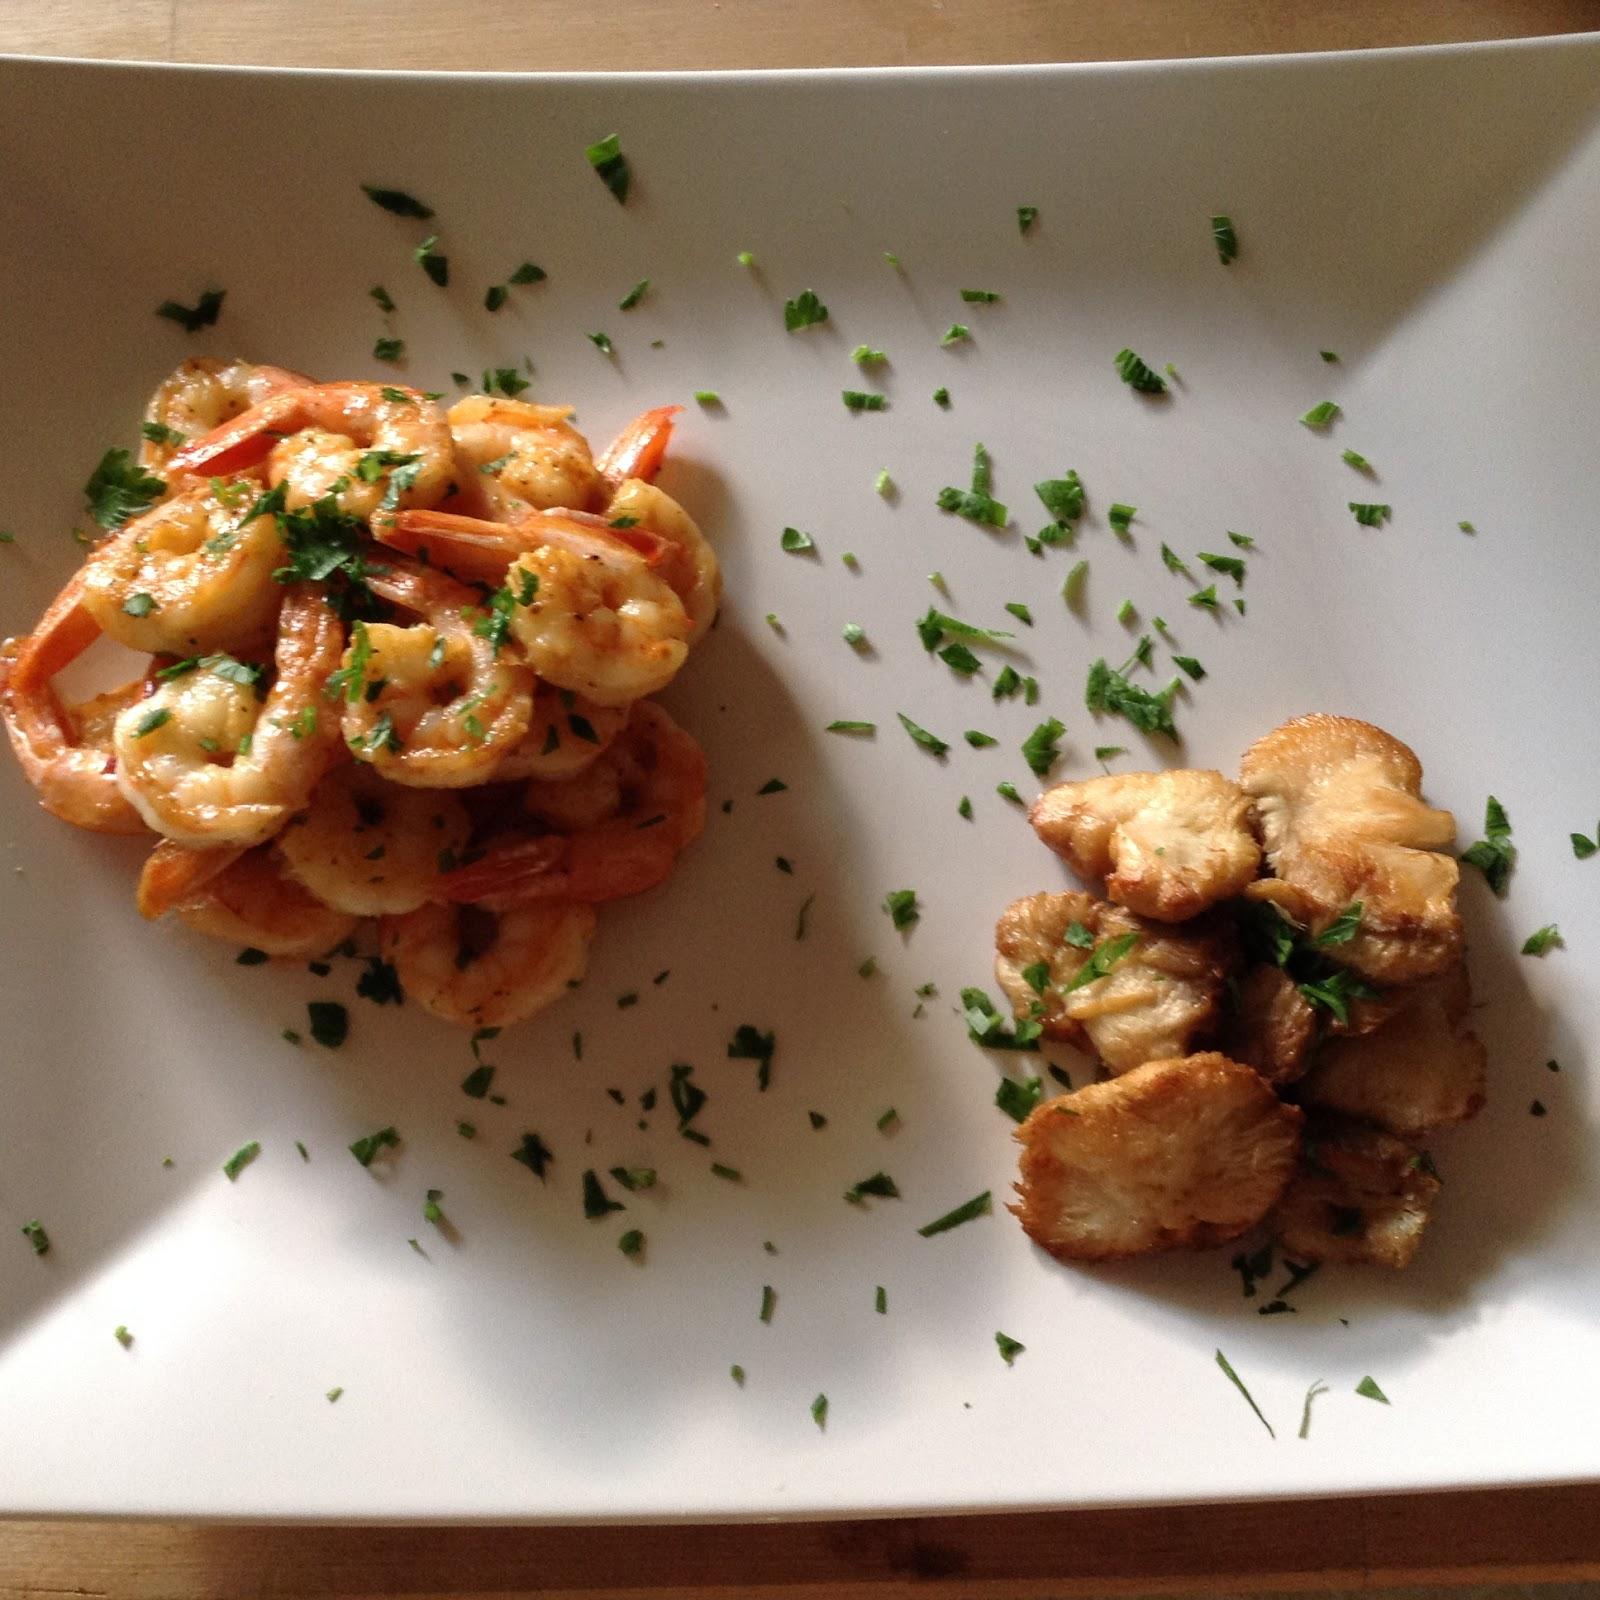 Little Kitchen Westport Ct: Our Little Green Kitchen: Lion's Mane And Shrimp Paired